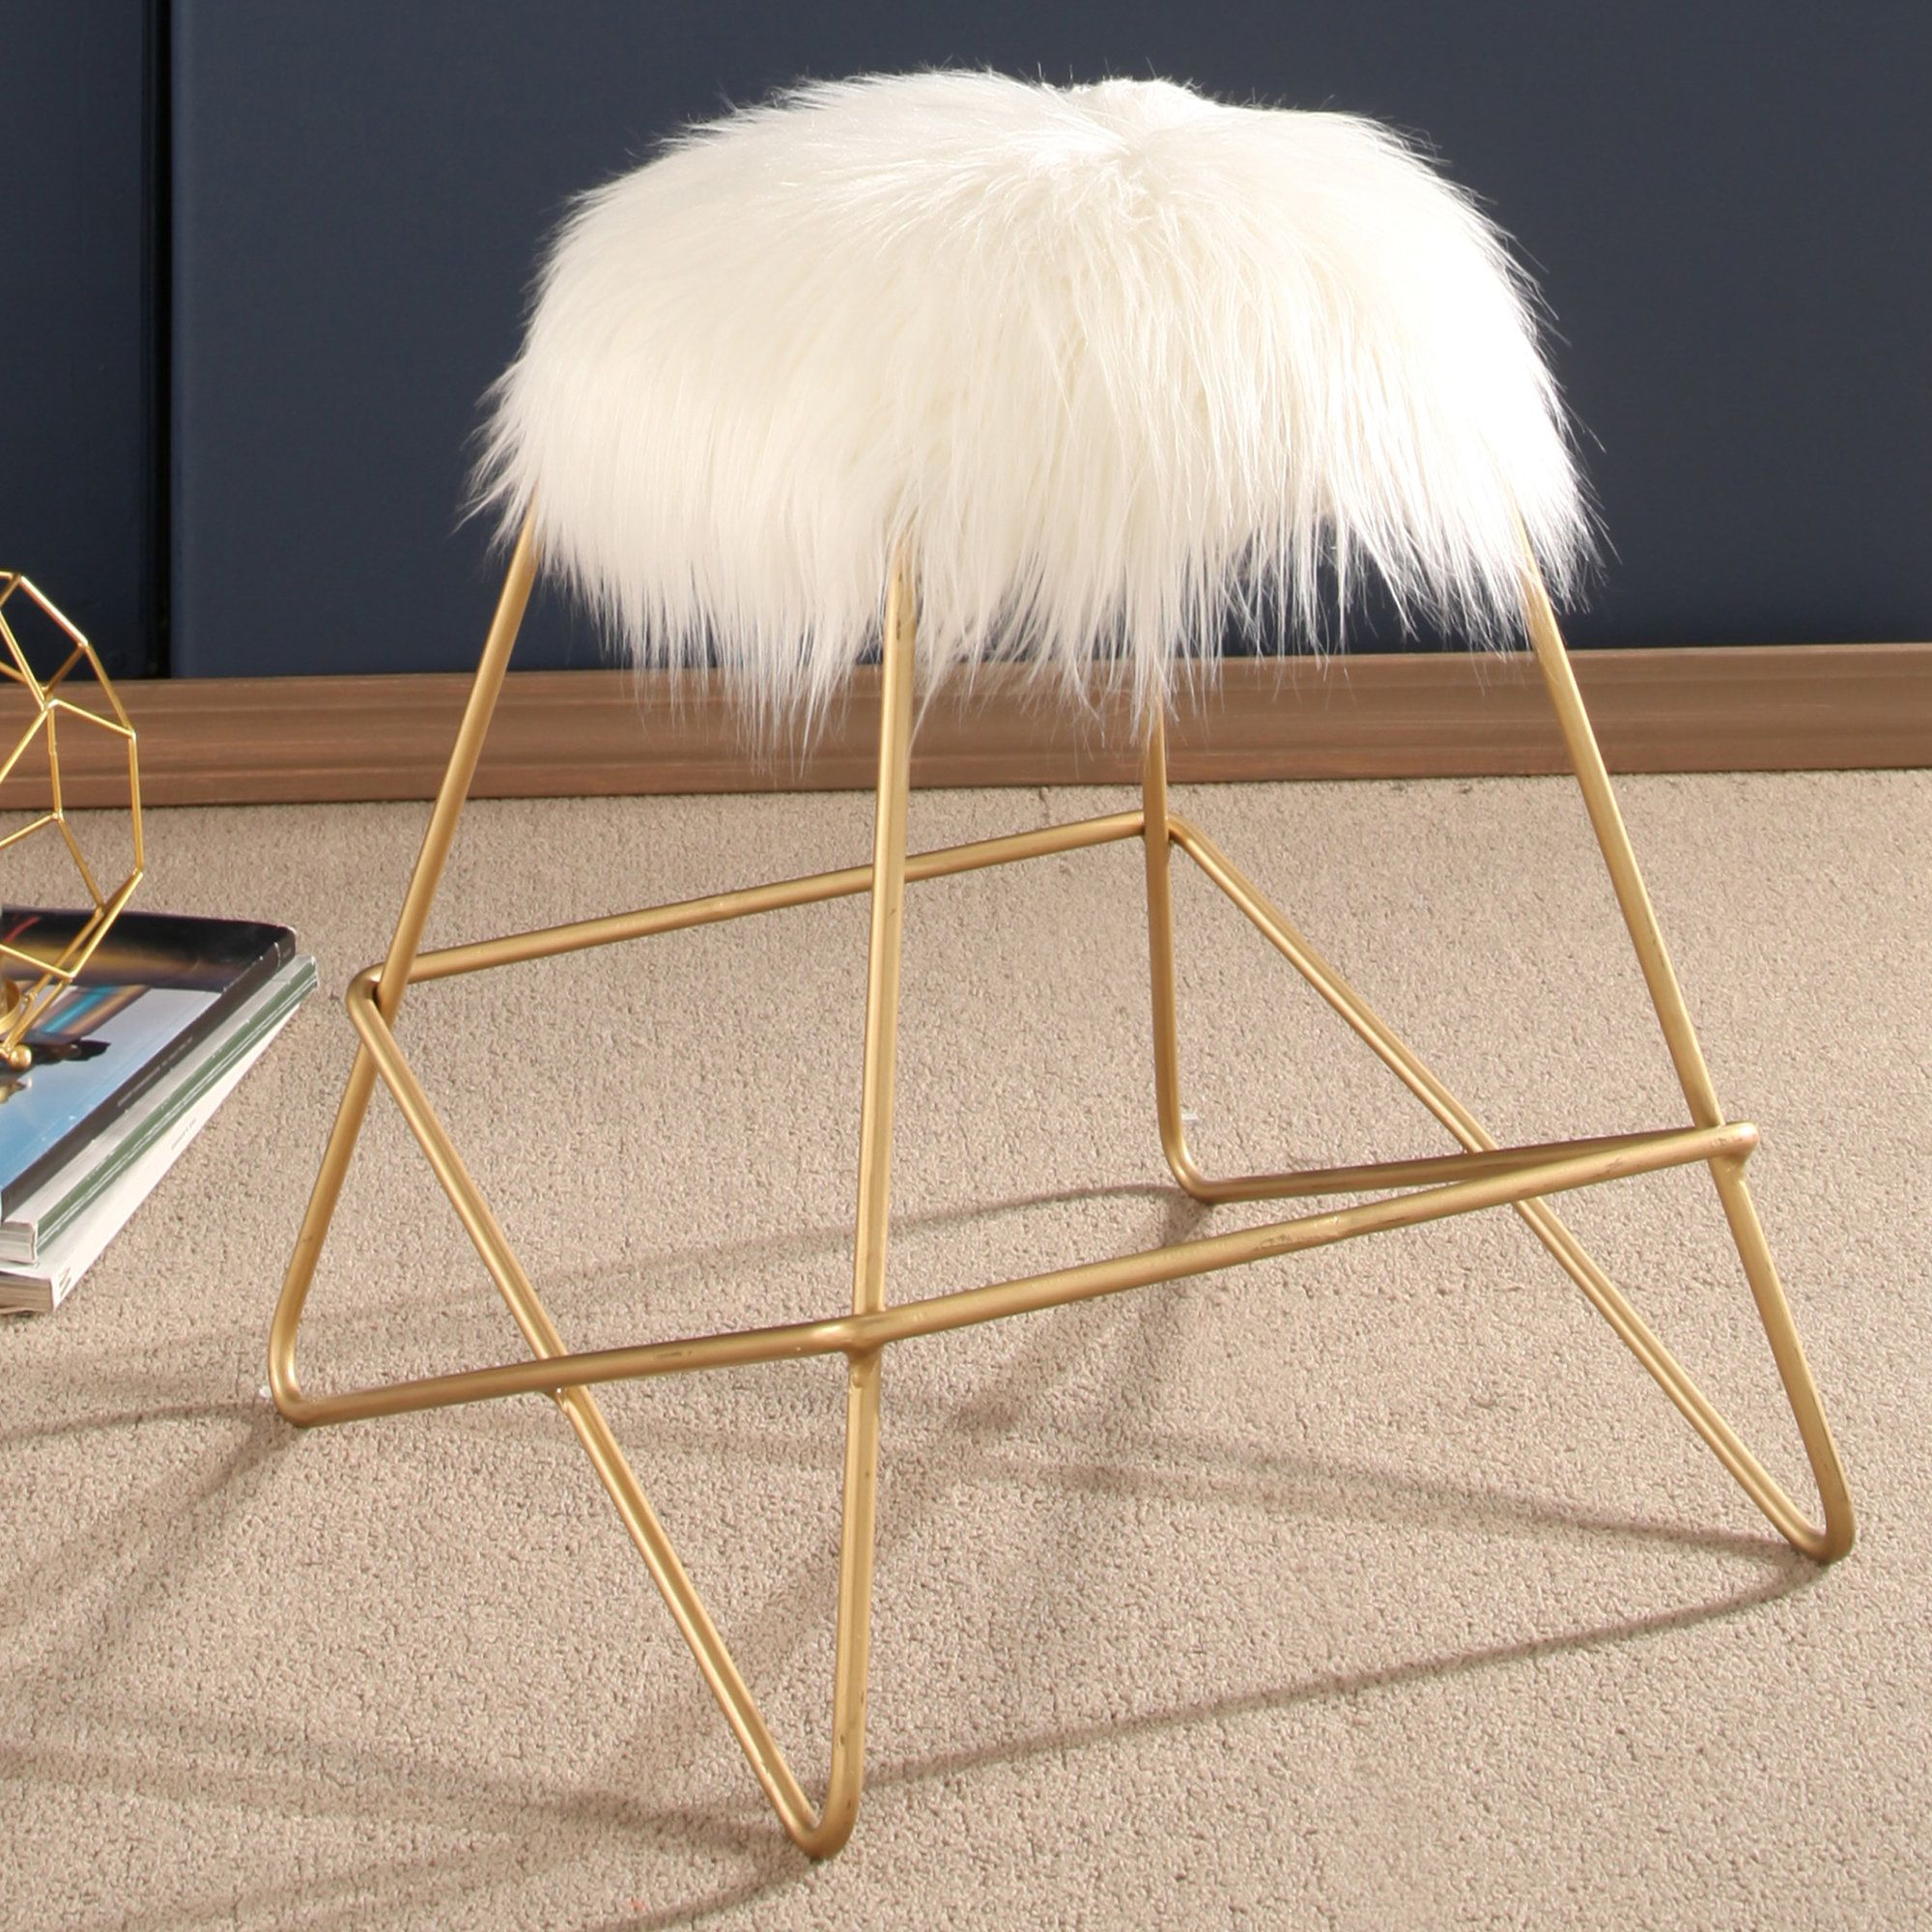 Lederman Faux Fur Vanity Stool Vanity stool, Stool, Fur